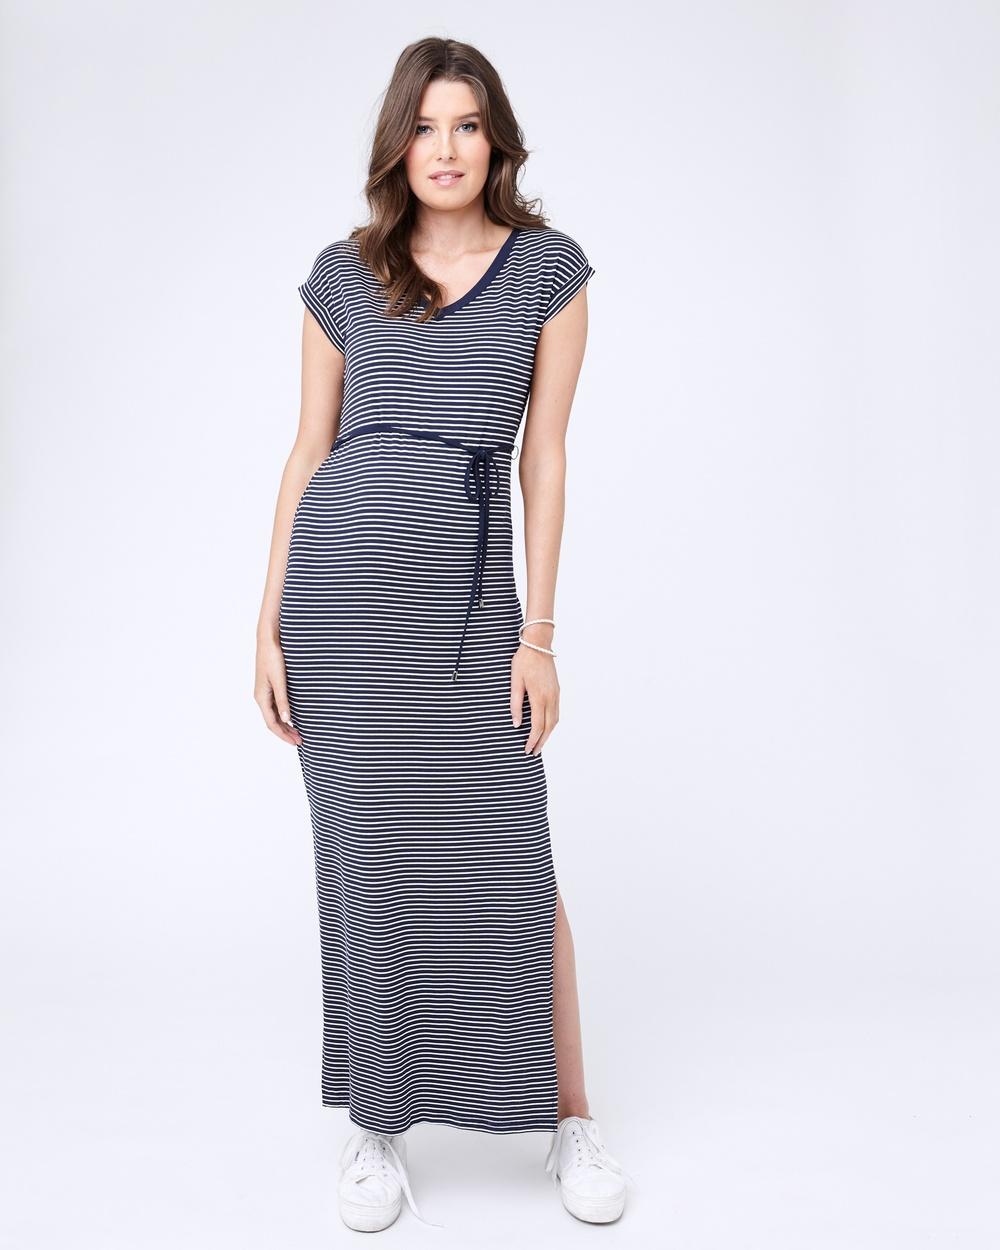 Ripe Maternity Meghan Striped Maxi Dress Dresses Navy-White Meghan Striped Maxi Dress